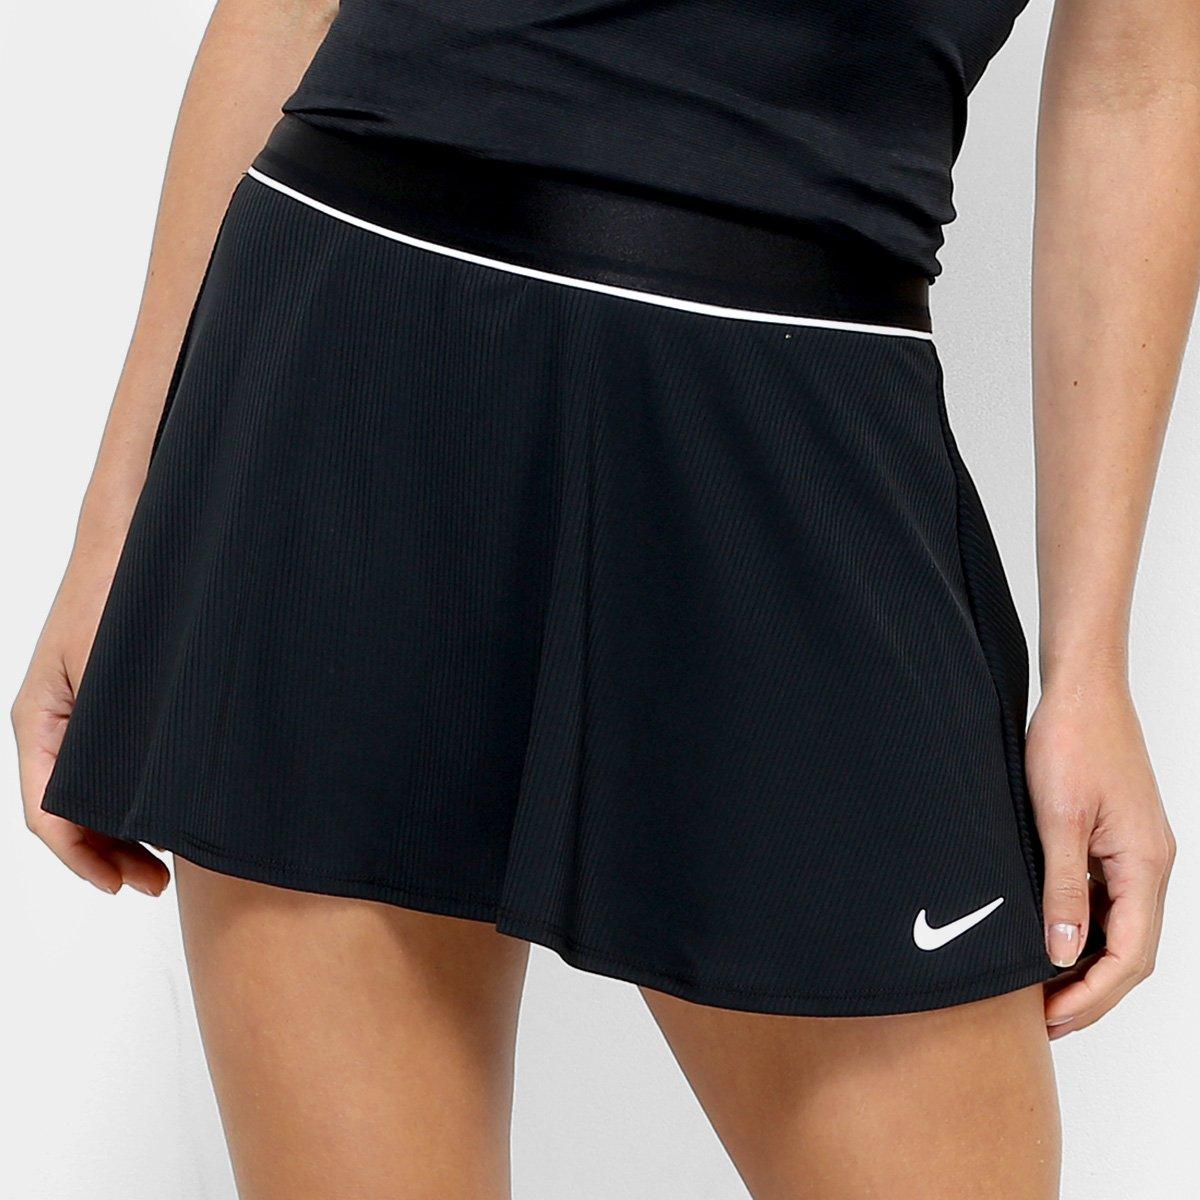 Saia Nike Skirt Feminina